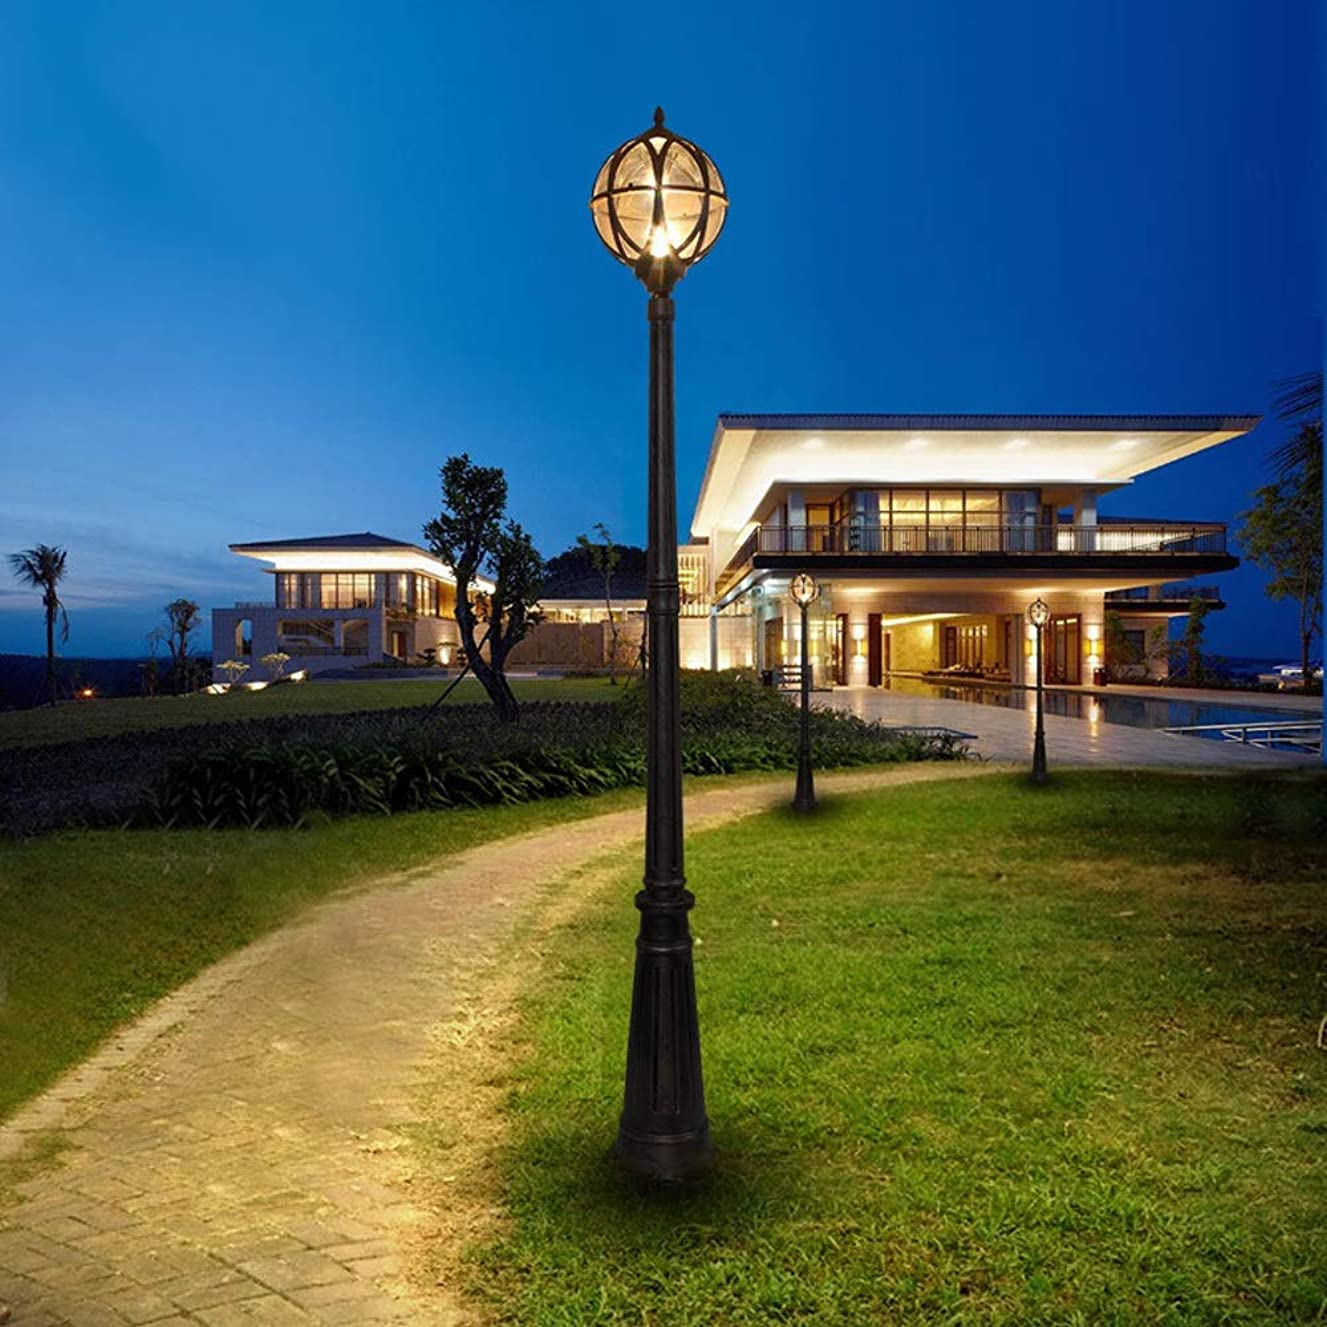 Rishx Outdoor LED Street Light Post Light Villa Waterproof Landscape Pole Lamp European Rainproof Garden Road Lights Community High Pole Lantern Column Lamp (Size : Height 2.4m)